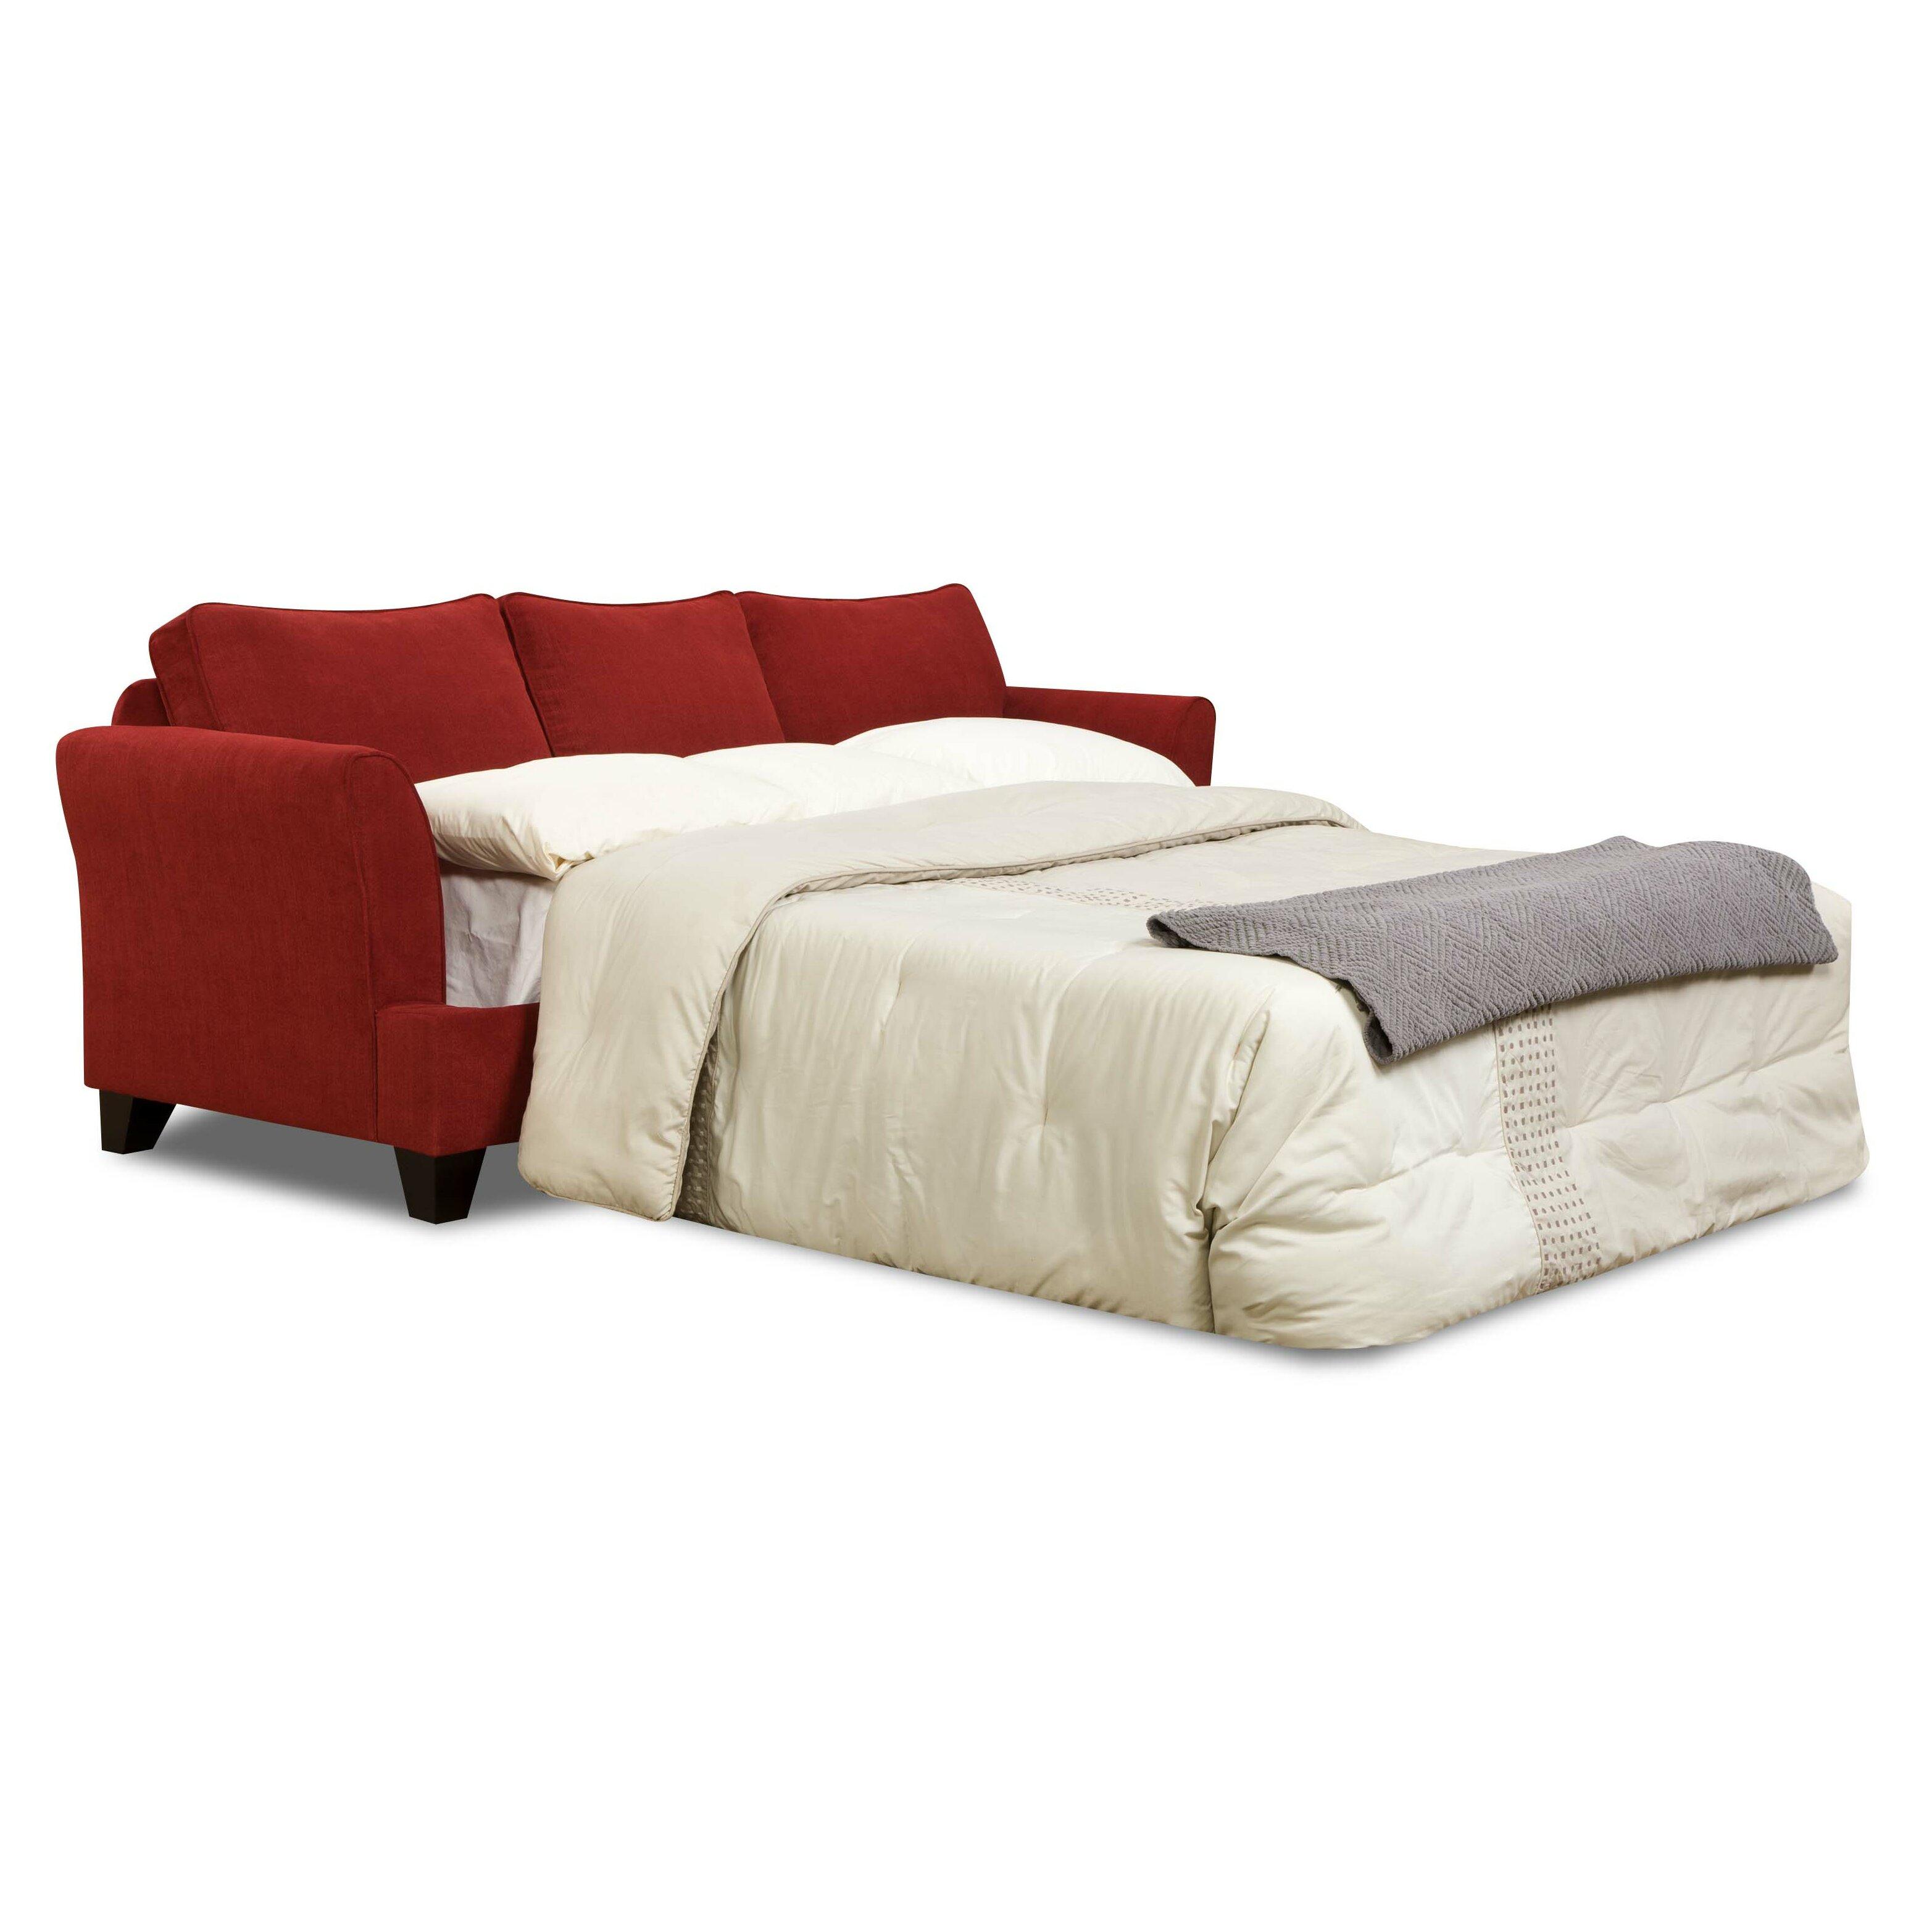 Simmons Upholstery Farley Queen Sleeper Sofa Aecagraorg